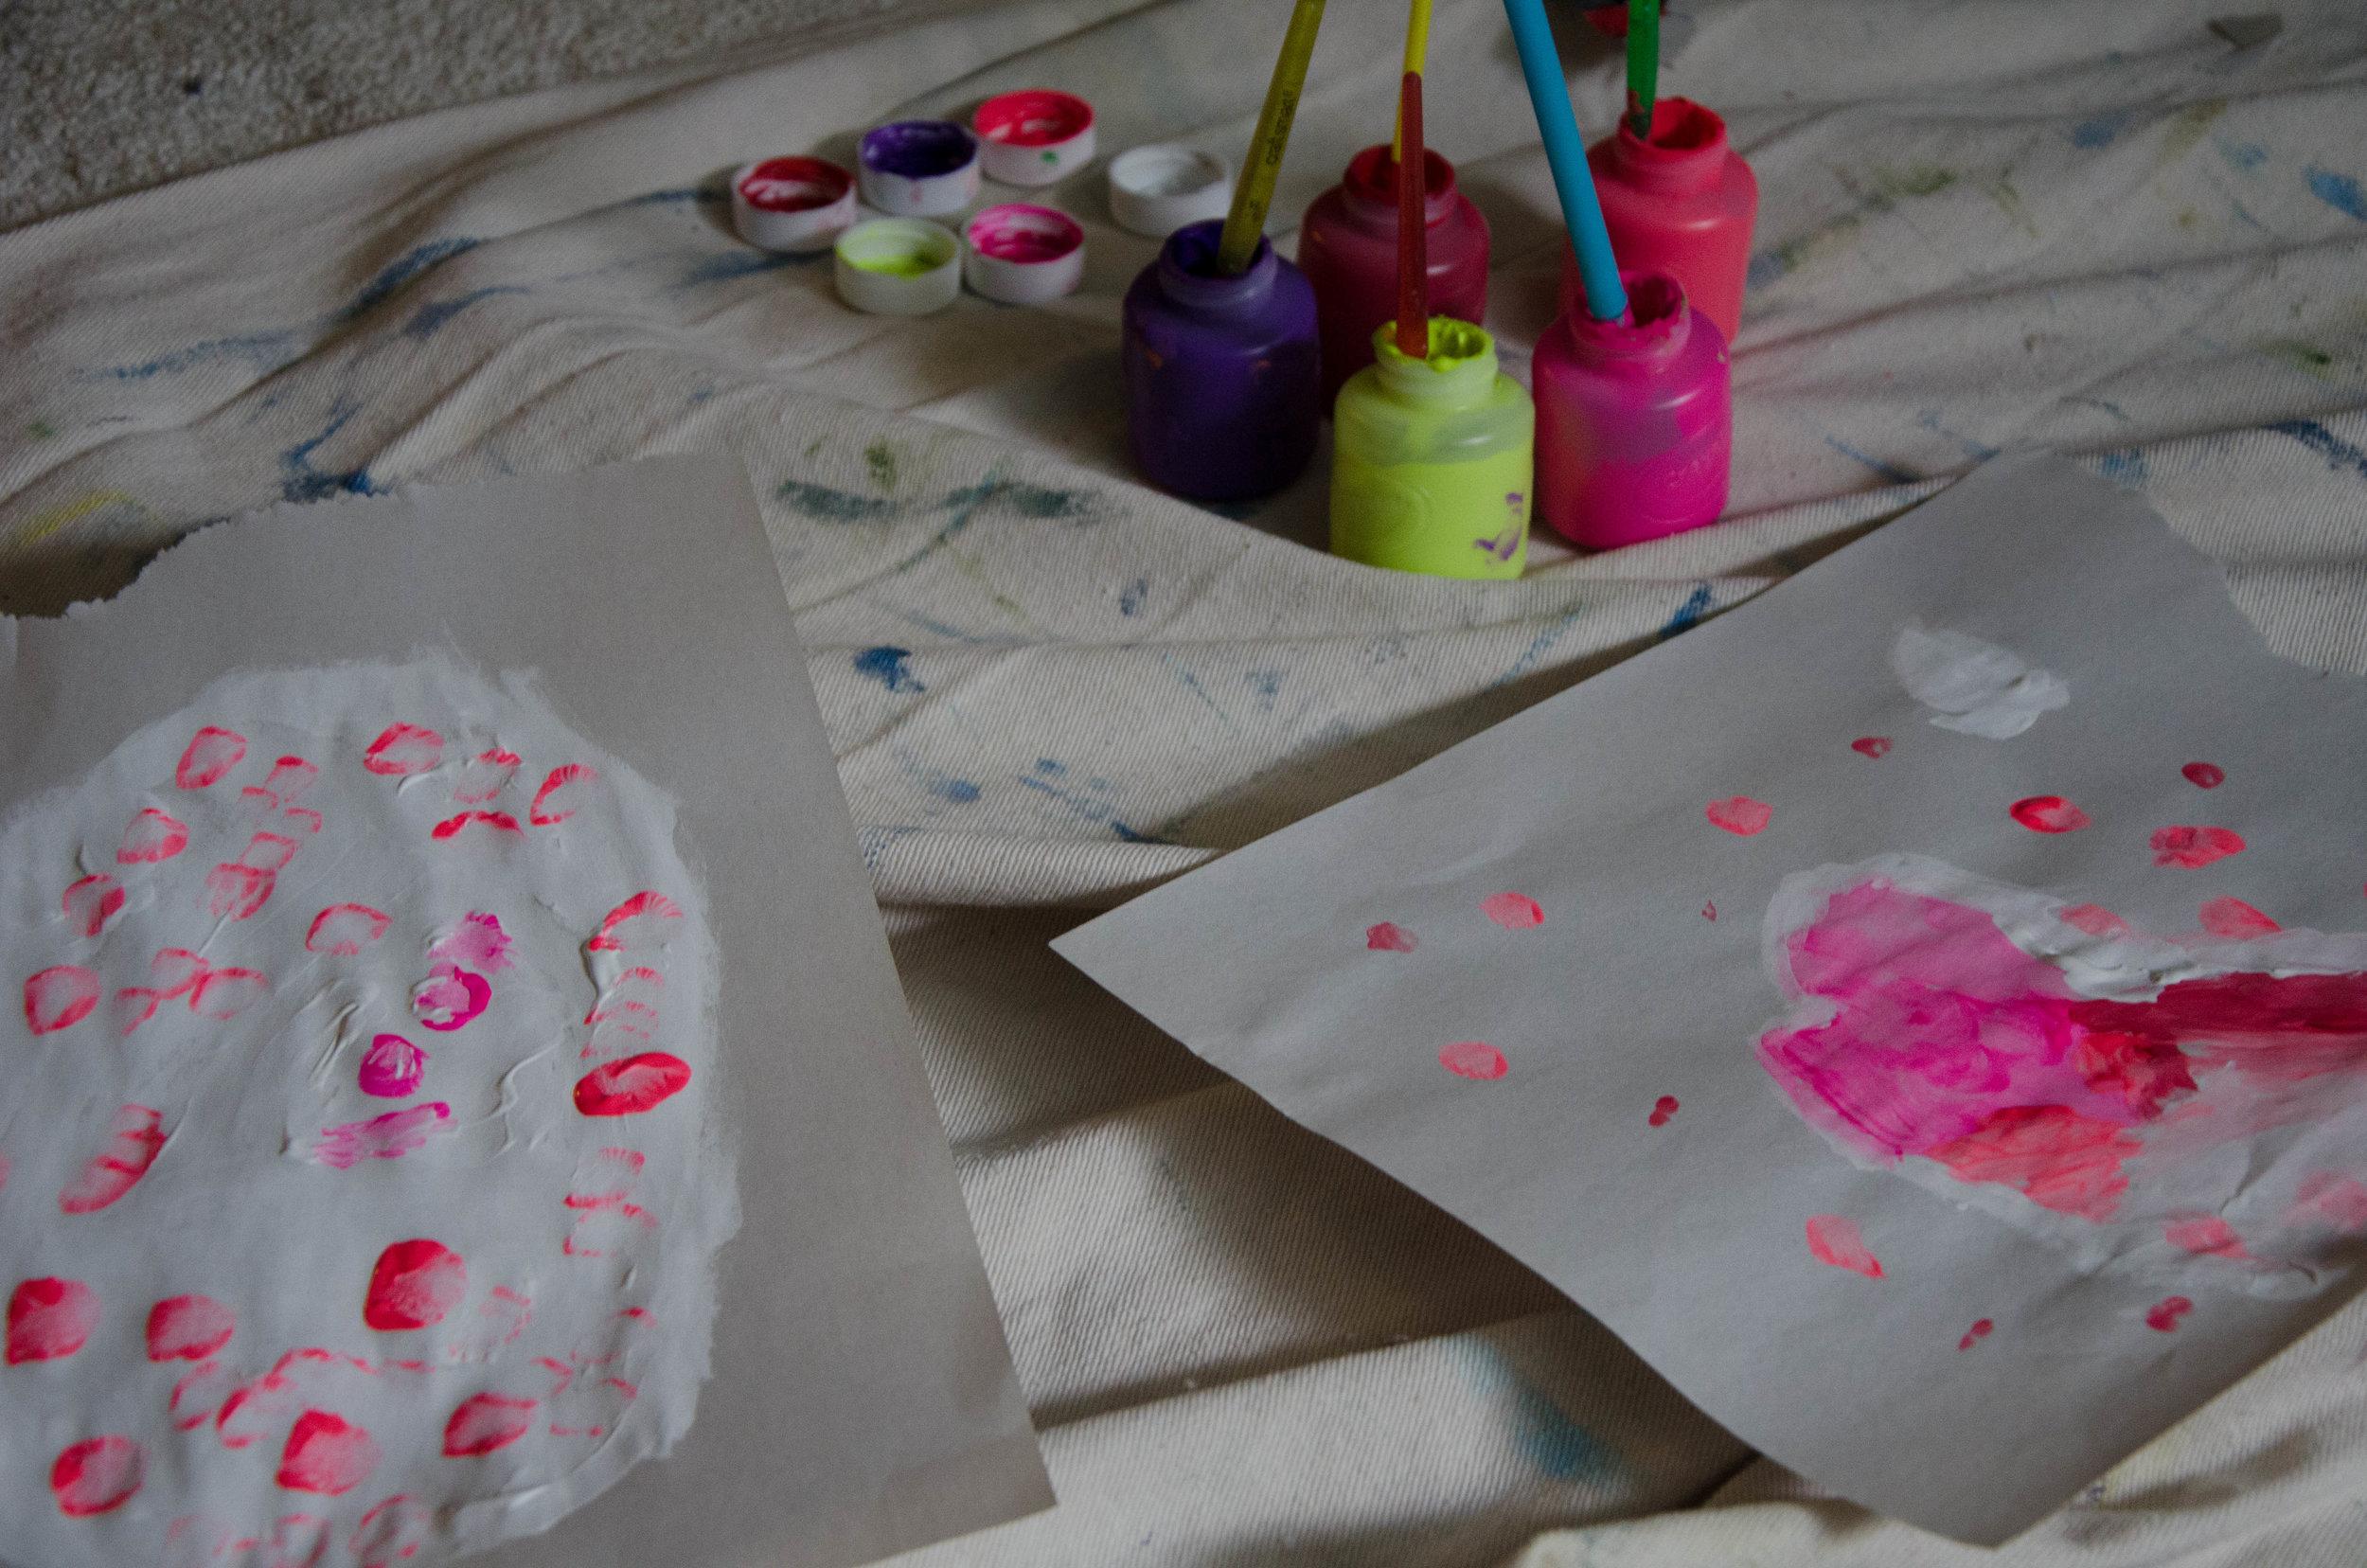 marysia-champ-art-studio-process-supplies-paint-brushes-canvas-creativity-and-kids